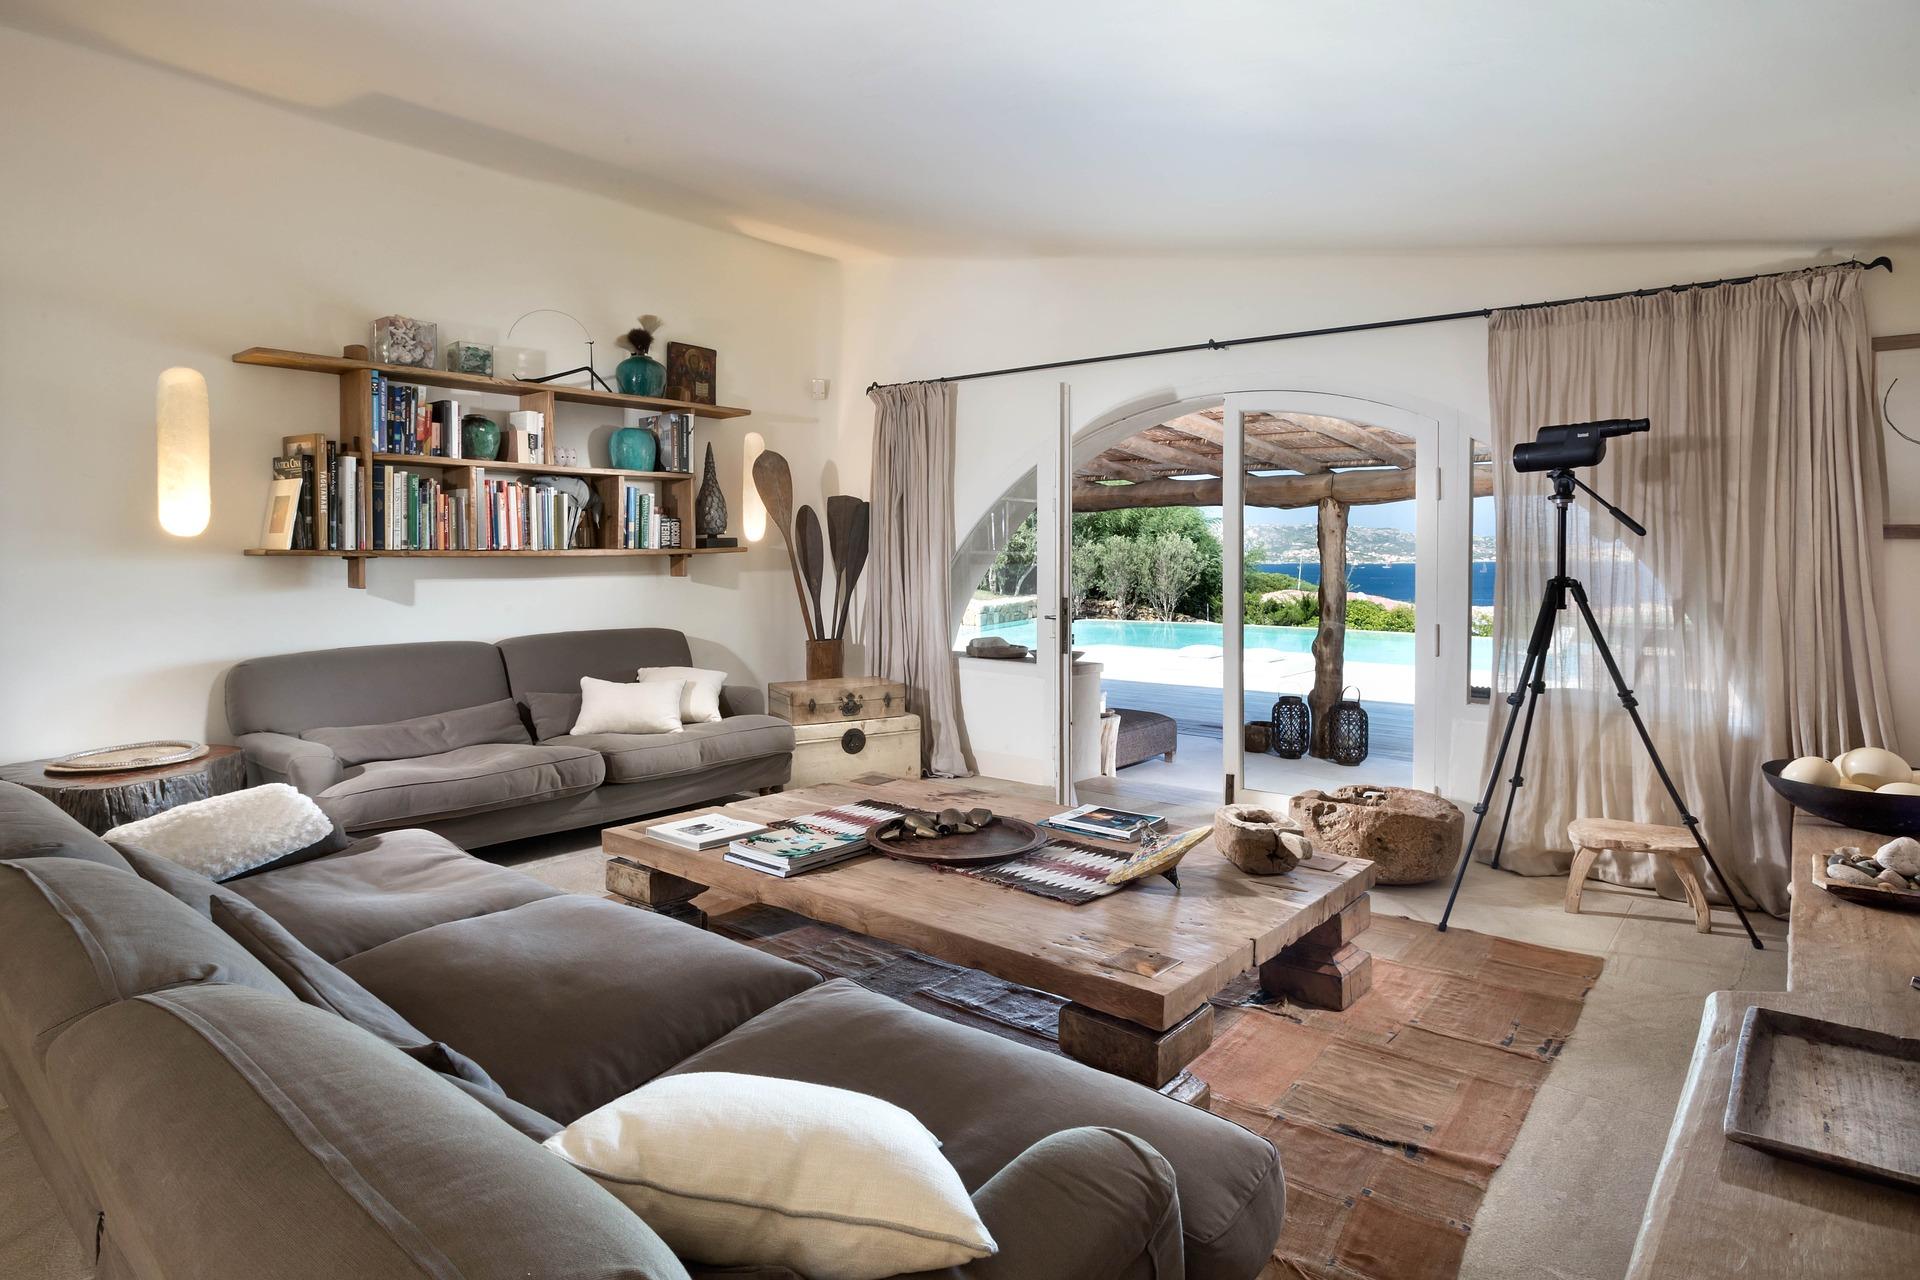 https://www.homewishez.nl/wp-content/uploads/2017/05/living-room-2037945_1920.jpg